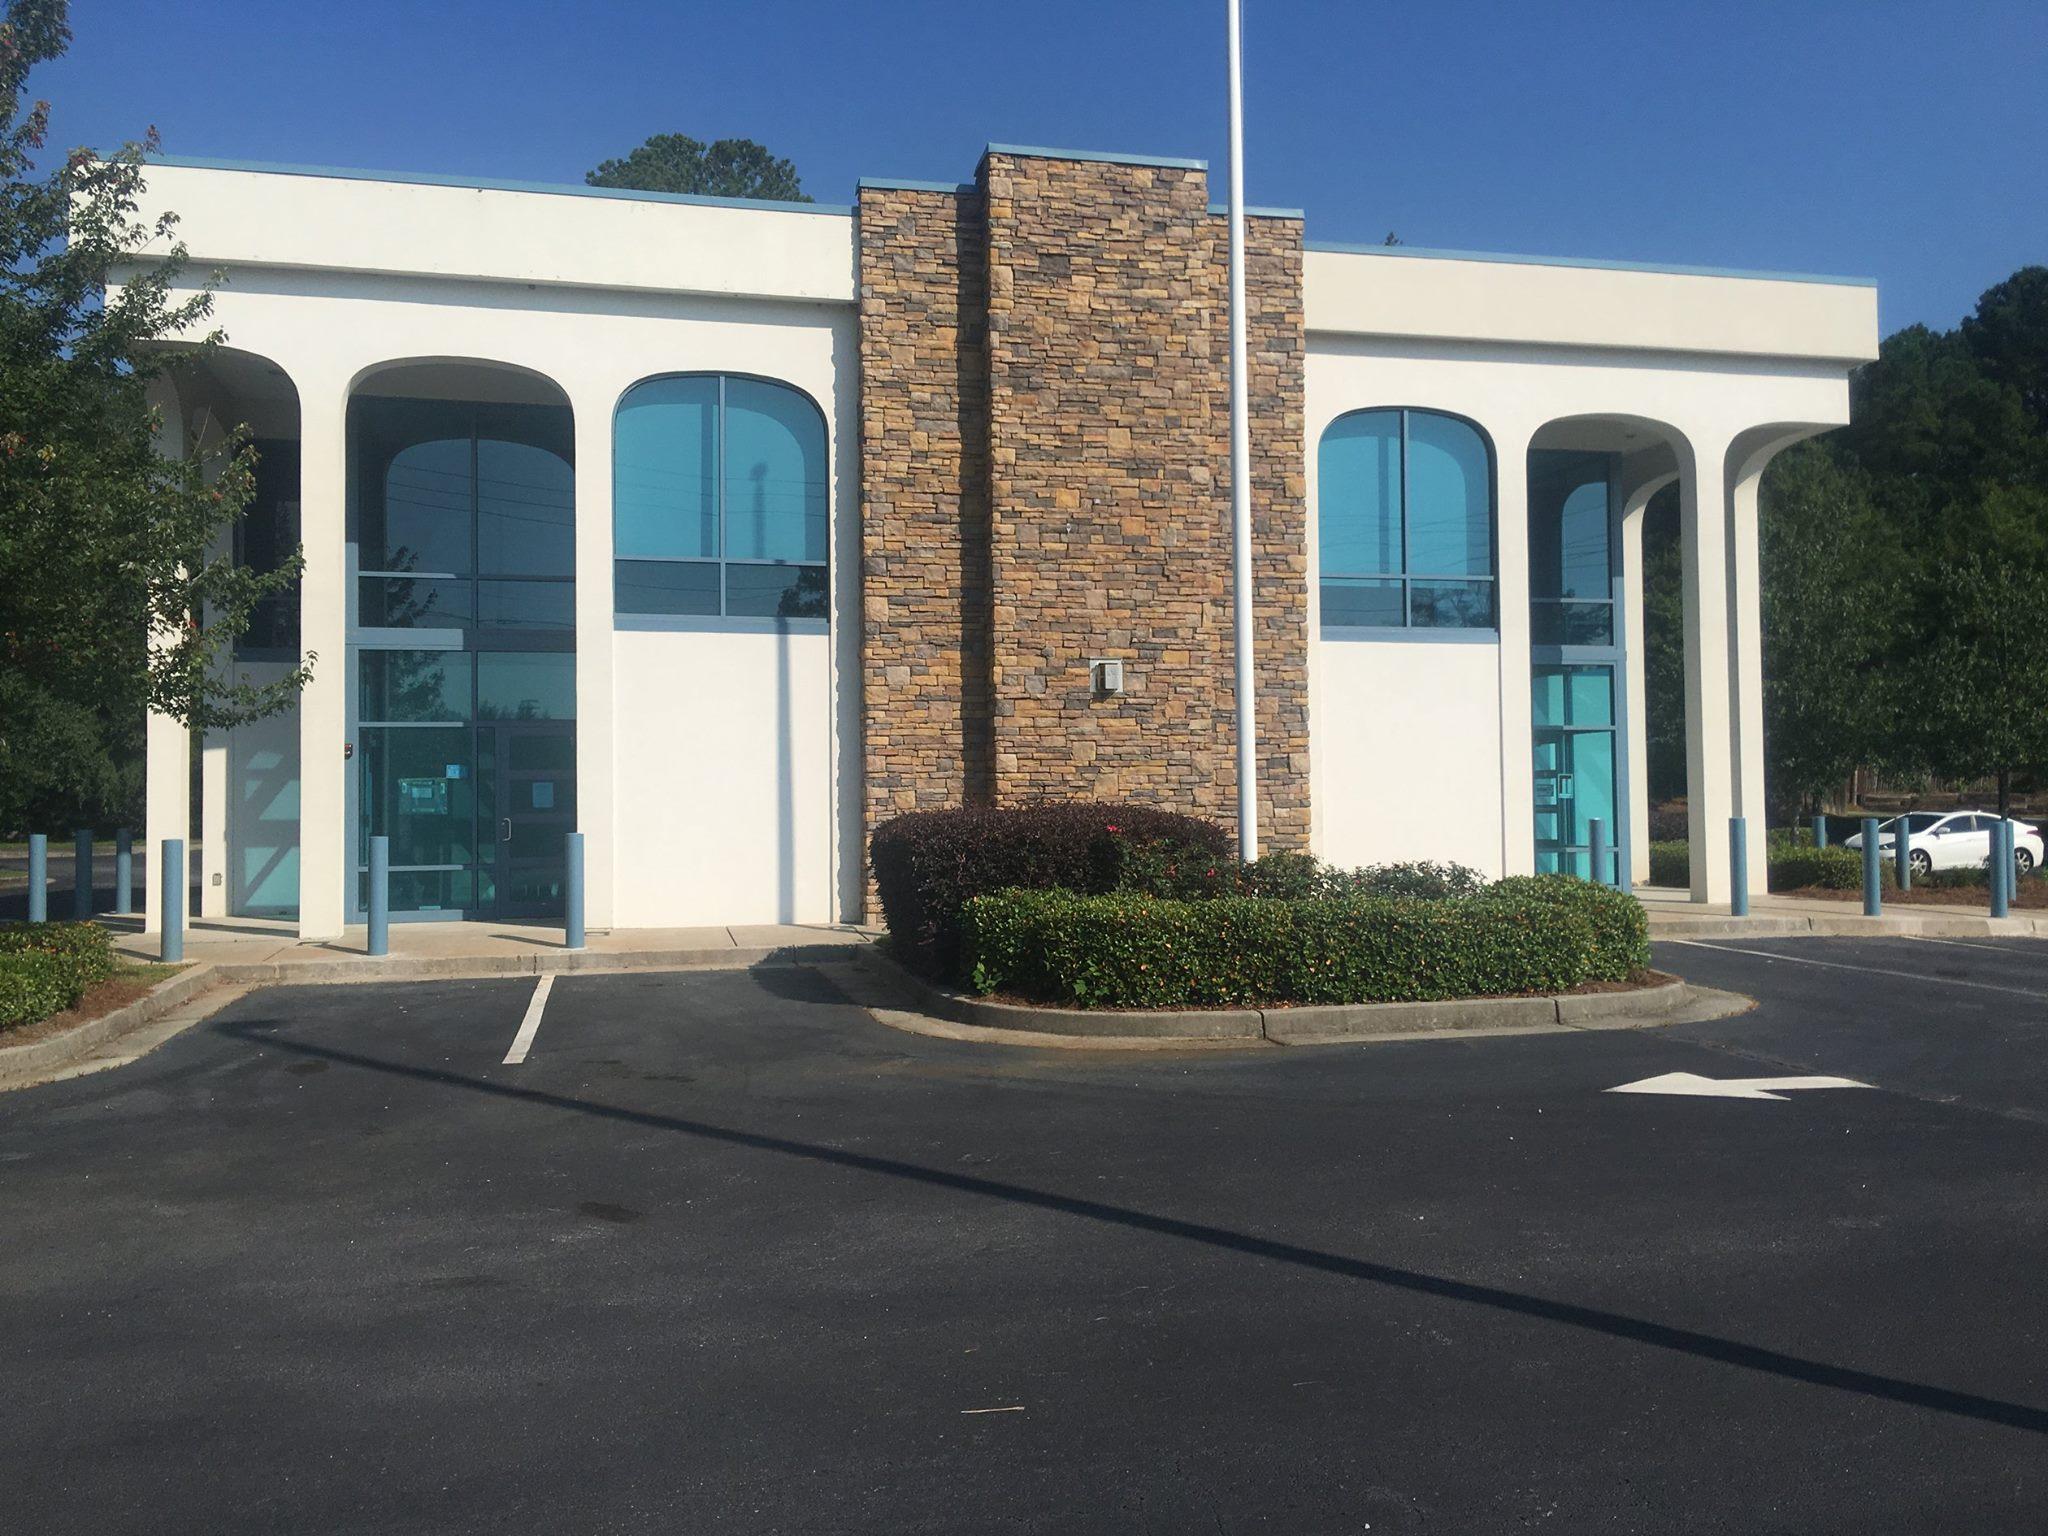 Emergency Pawn Shop - Covington, Georgia Contact